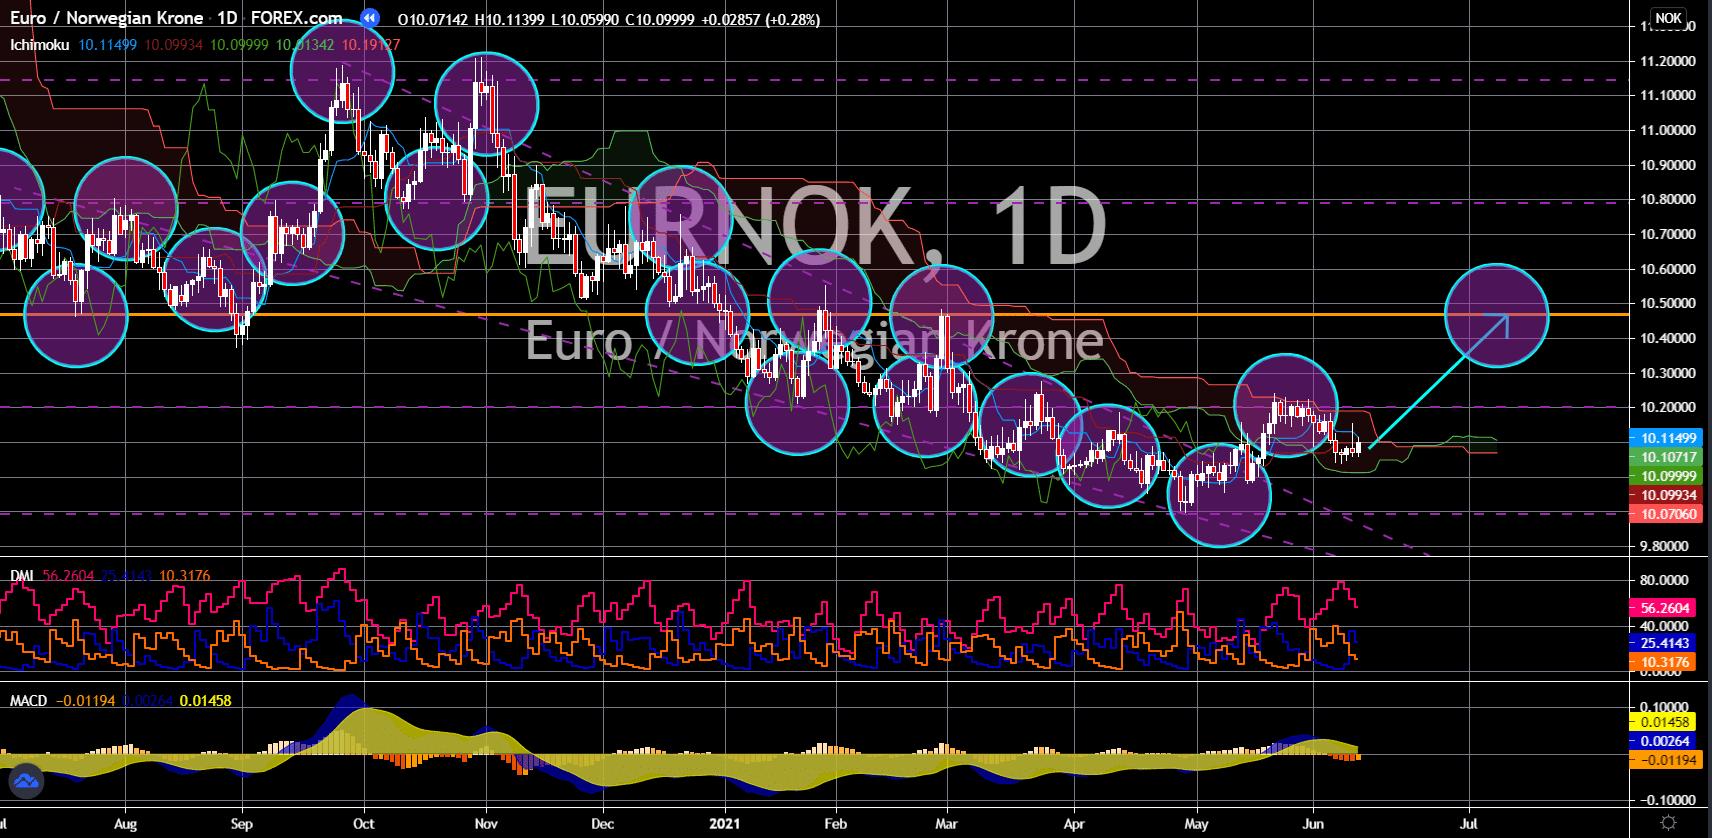 FinanceBrokerage - Market News: EUR/NOK Chart